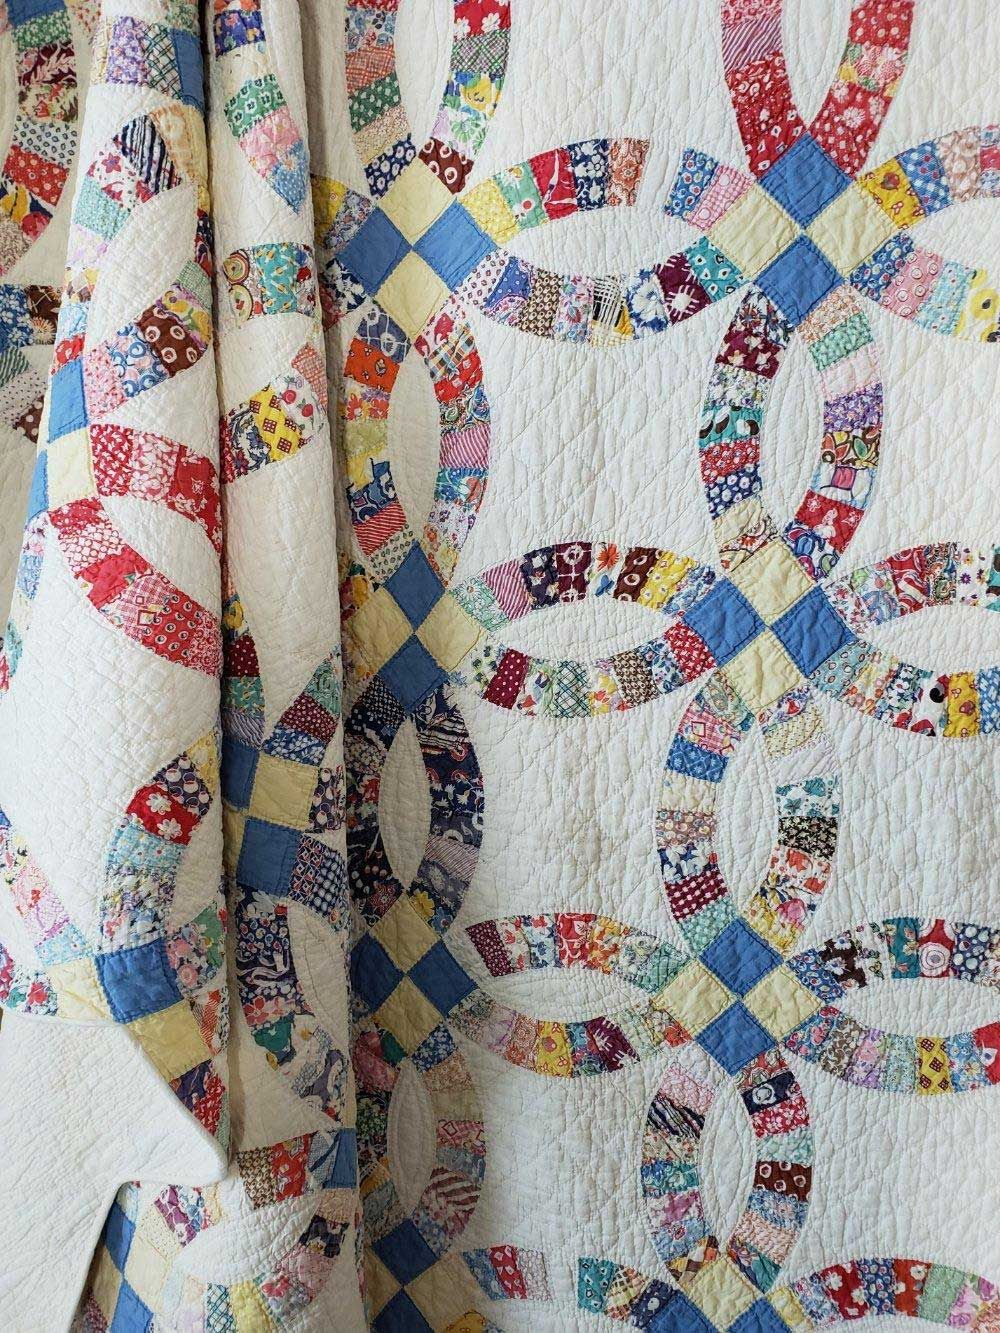 47 Amazing Vintage Wedding Ring Quilt Ideas Quilts Wedding Ring Quilt Vintage Quilts